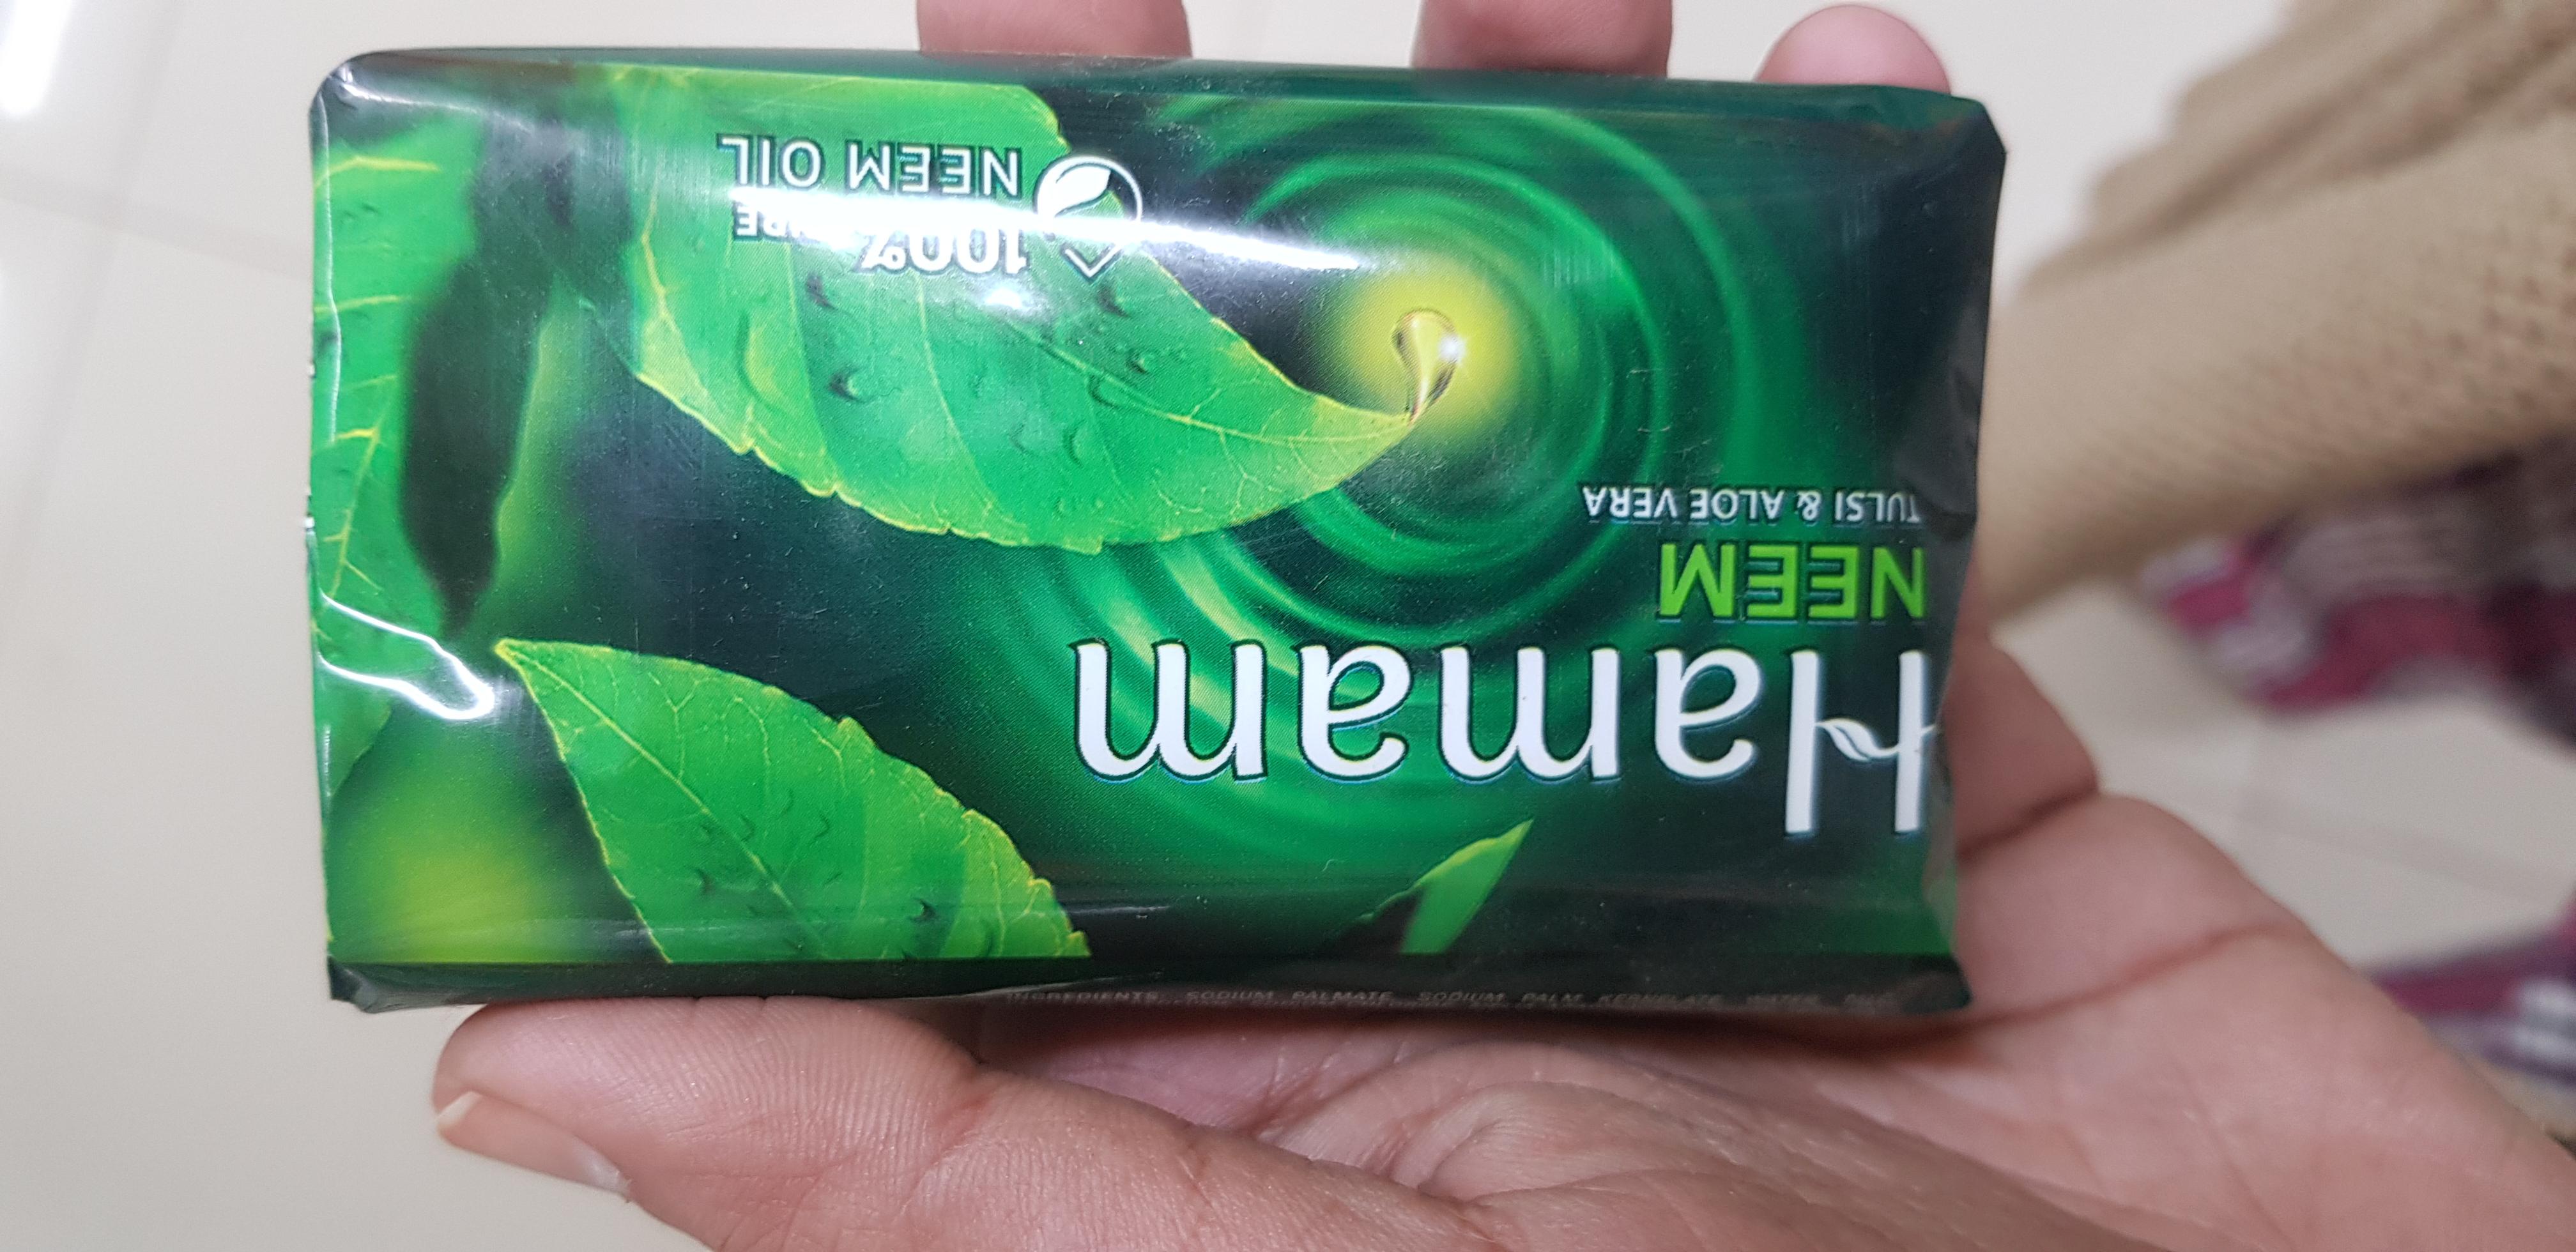 Hamam Neem Tulsi And Aloe Vera Soap Bar-Neem reduces acne-By avyuktha